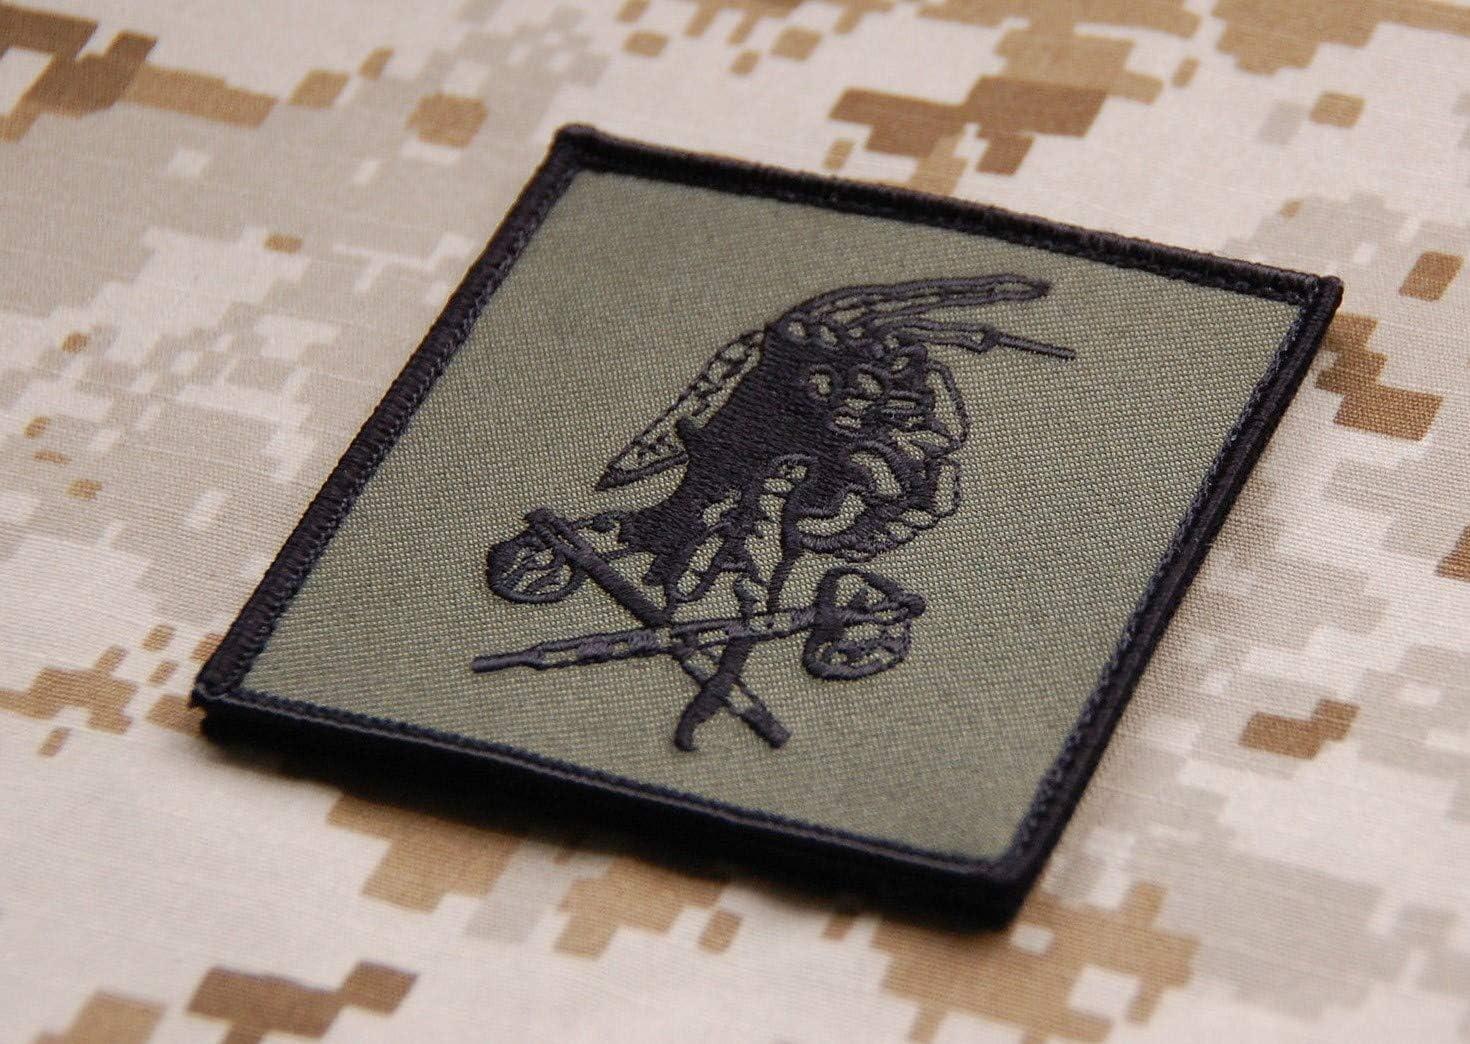 BritKitUSA NSWDG Red Squadron Team Patch OD Version AOR2 DEVGRU ST6 Red Team Bin Laden Raid